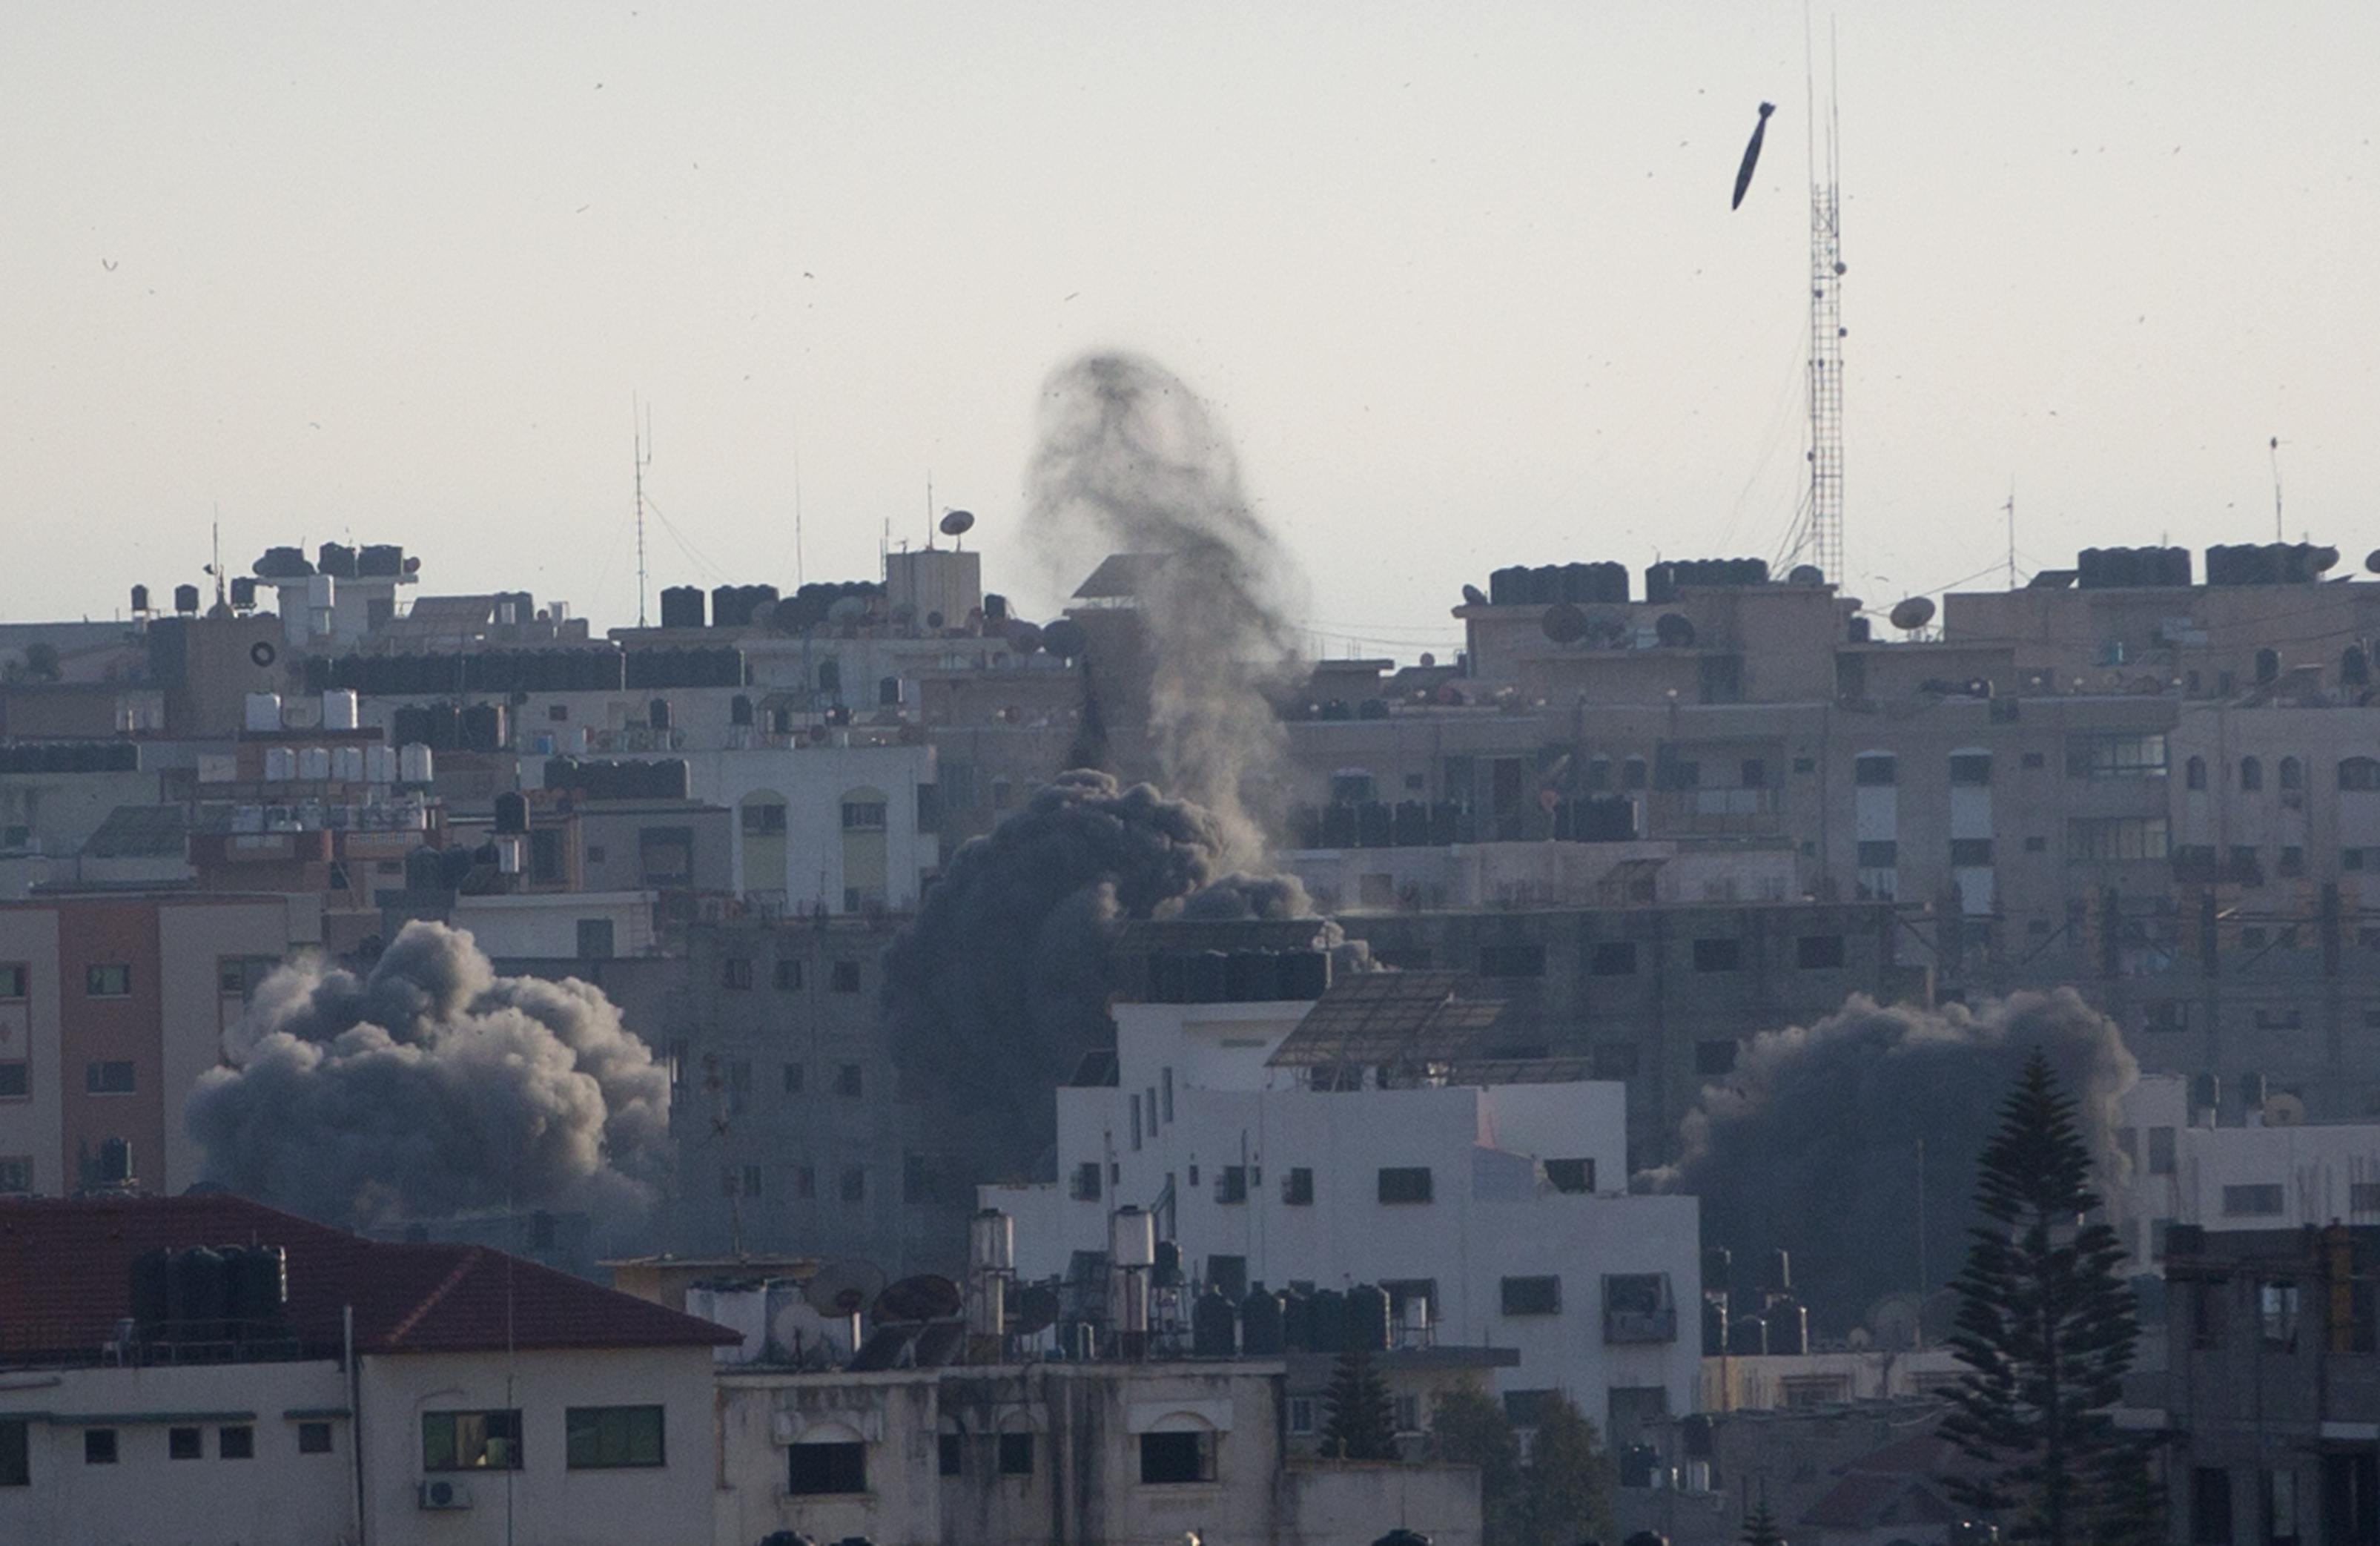 Ceasefire agreement reached between Palestine, Israel following fire exchange